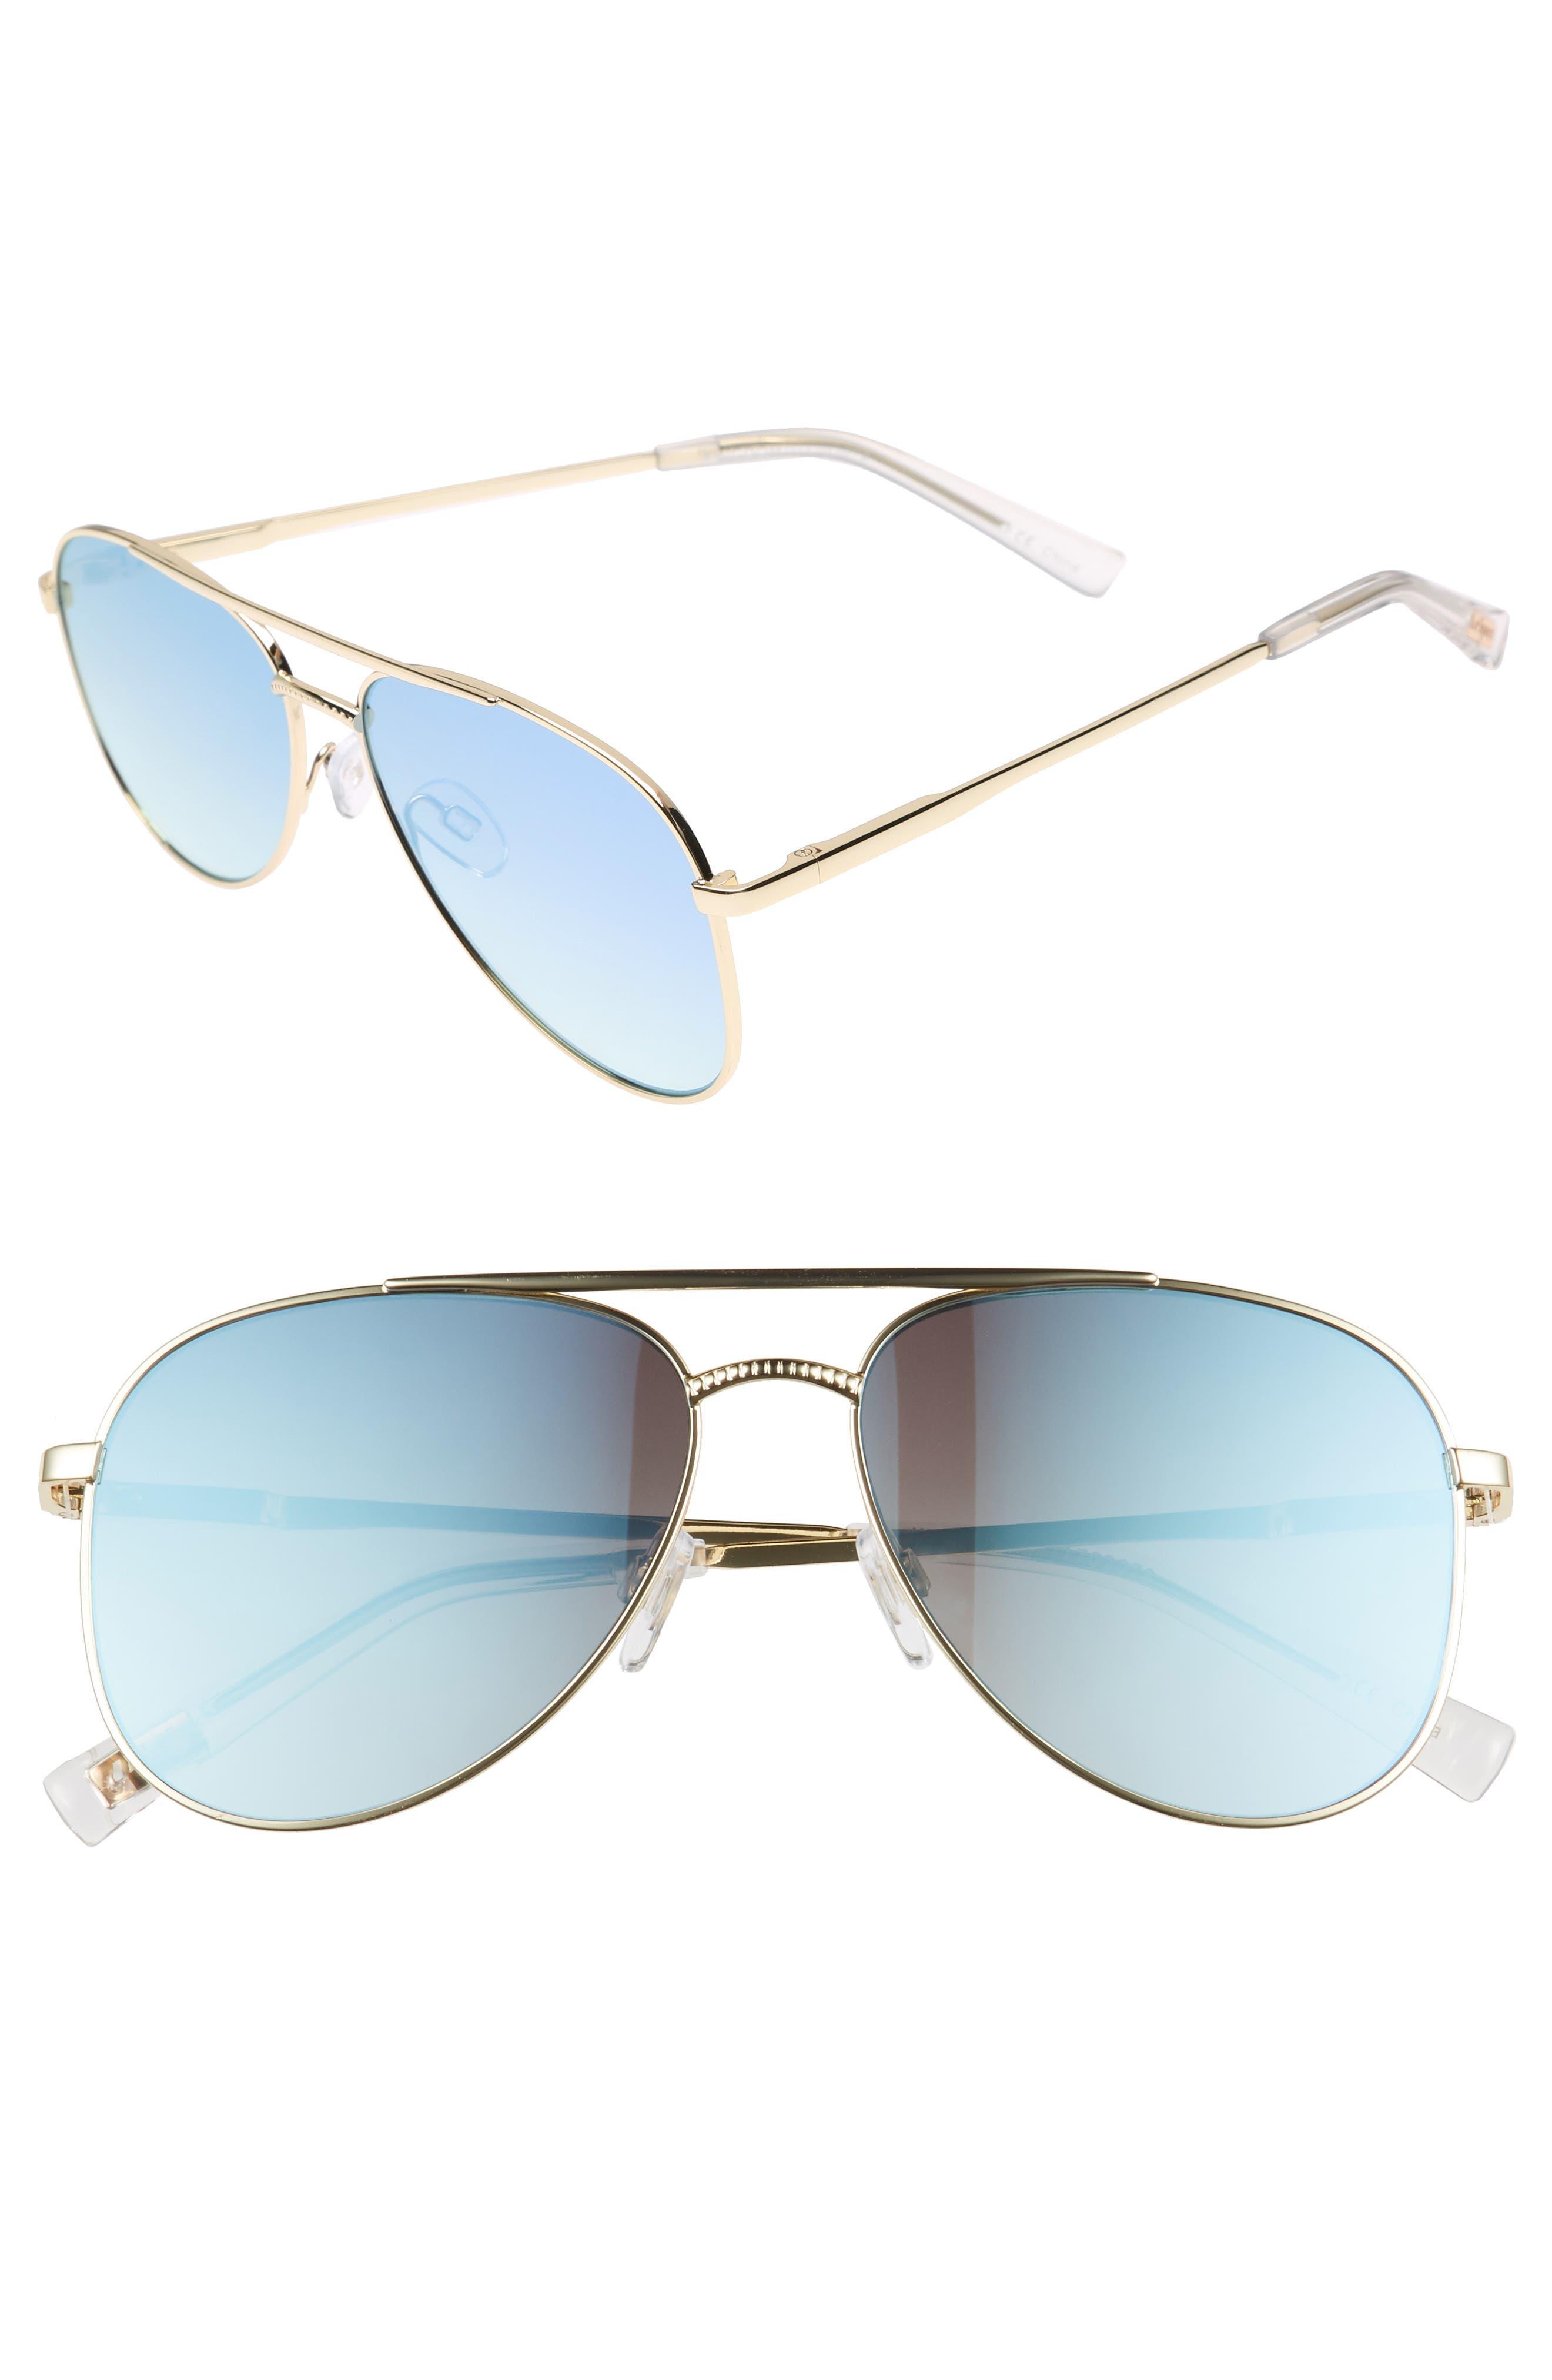 Kingdom 57mm Polarized Aviator Sunglasses,                             Main thumbnail 1, color,                             Bright Gold